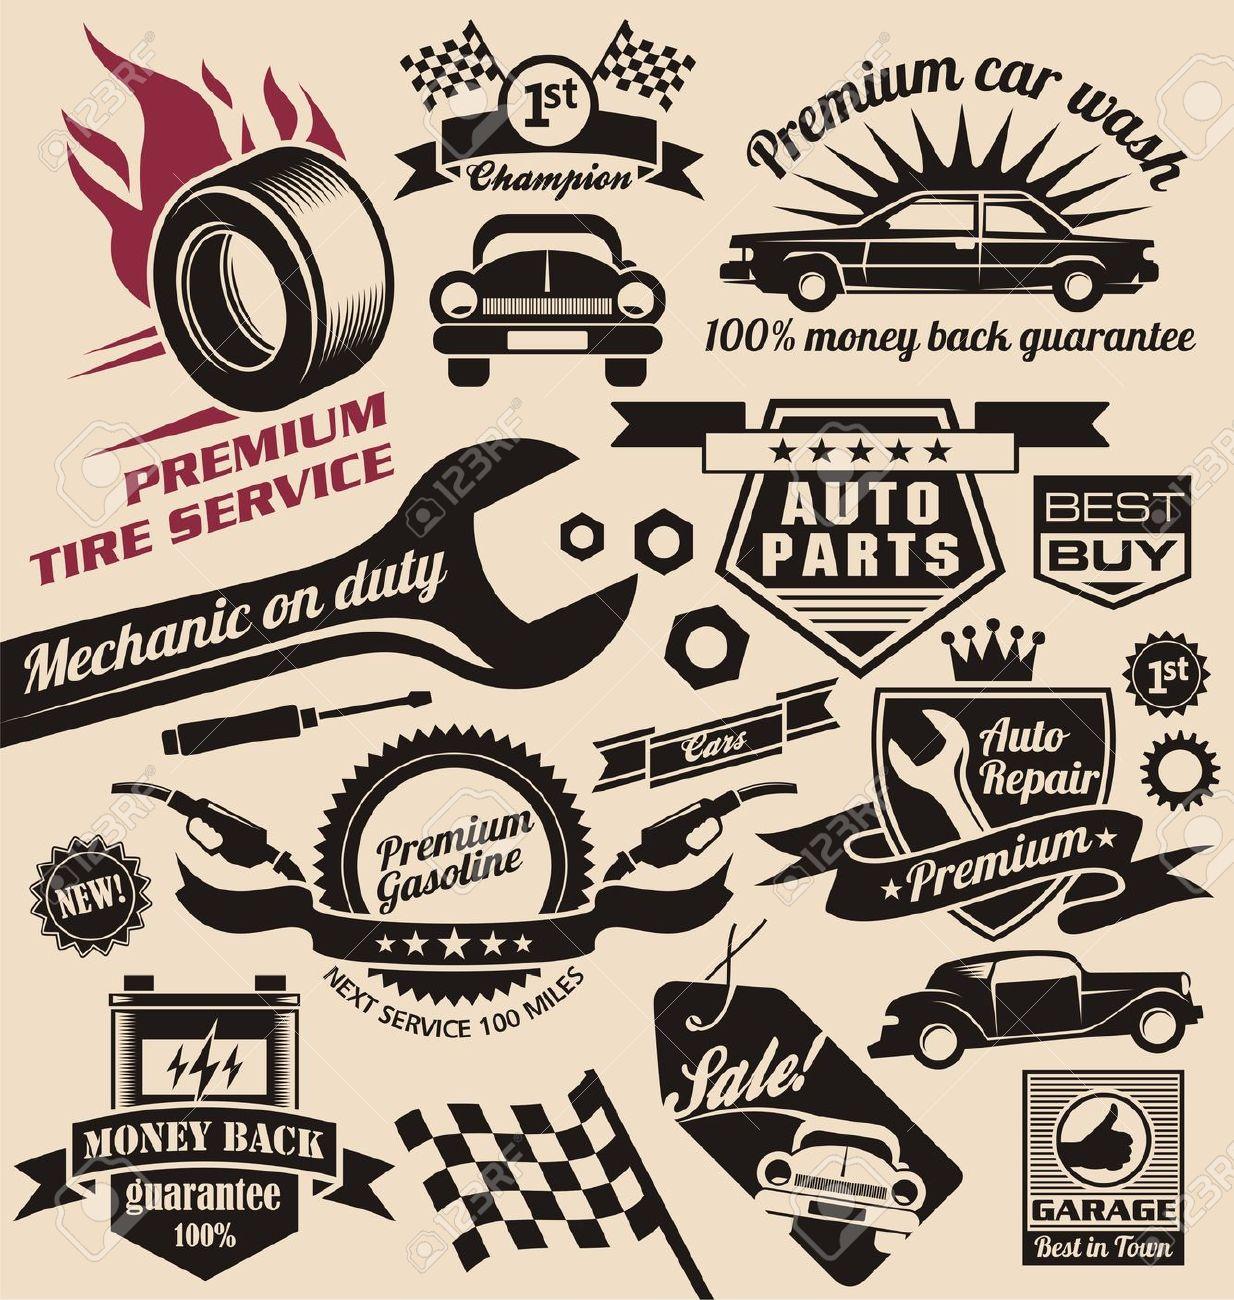 17432879-set-of-vintage-car-symbols-and-logos-Stock-Vector-auto ...